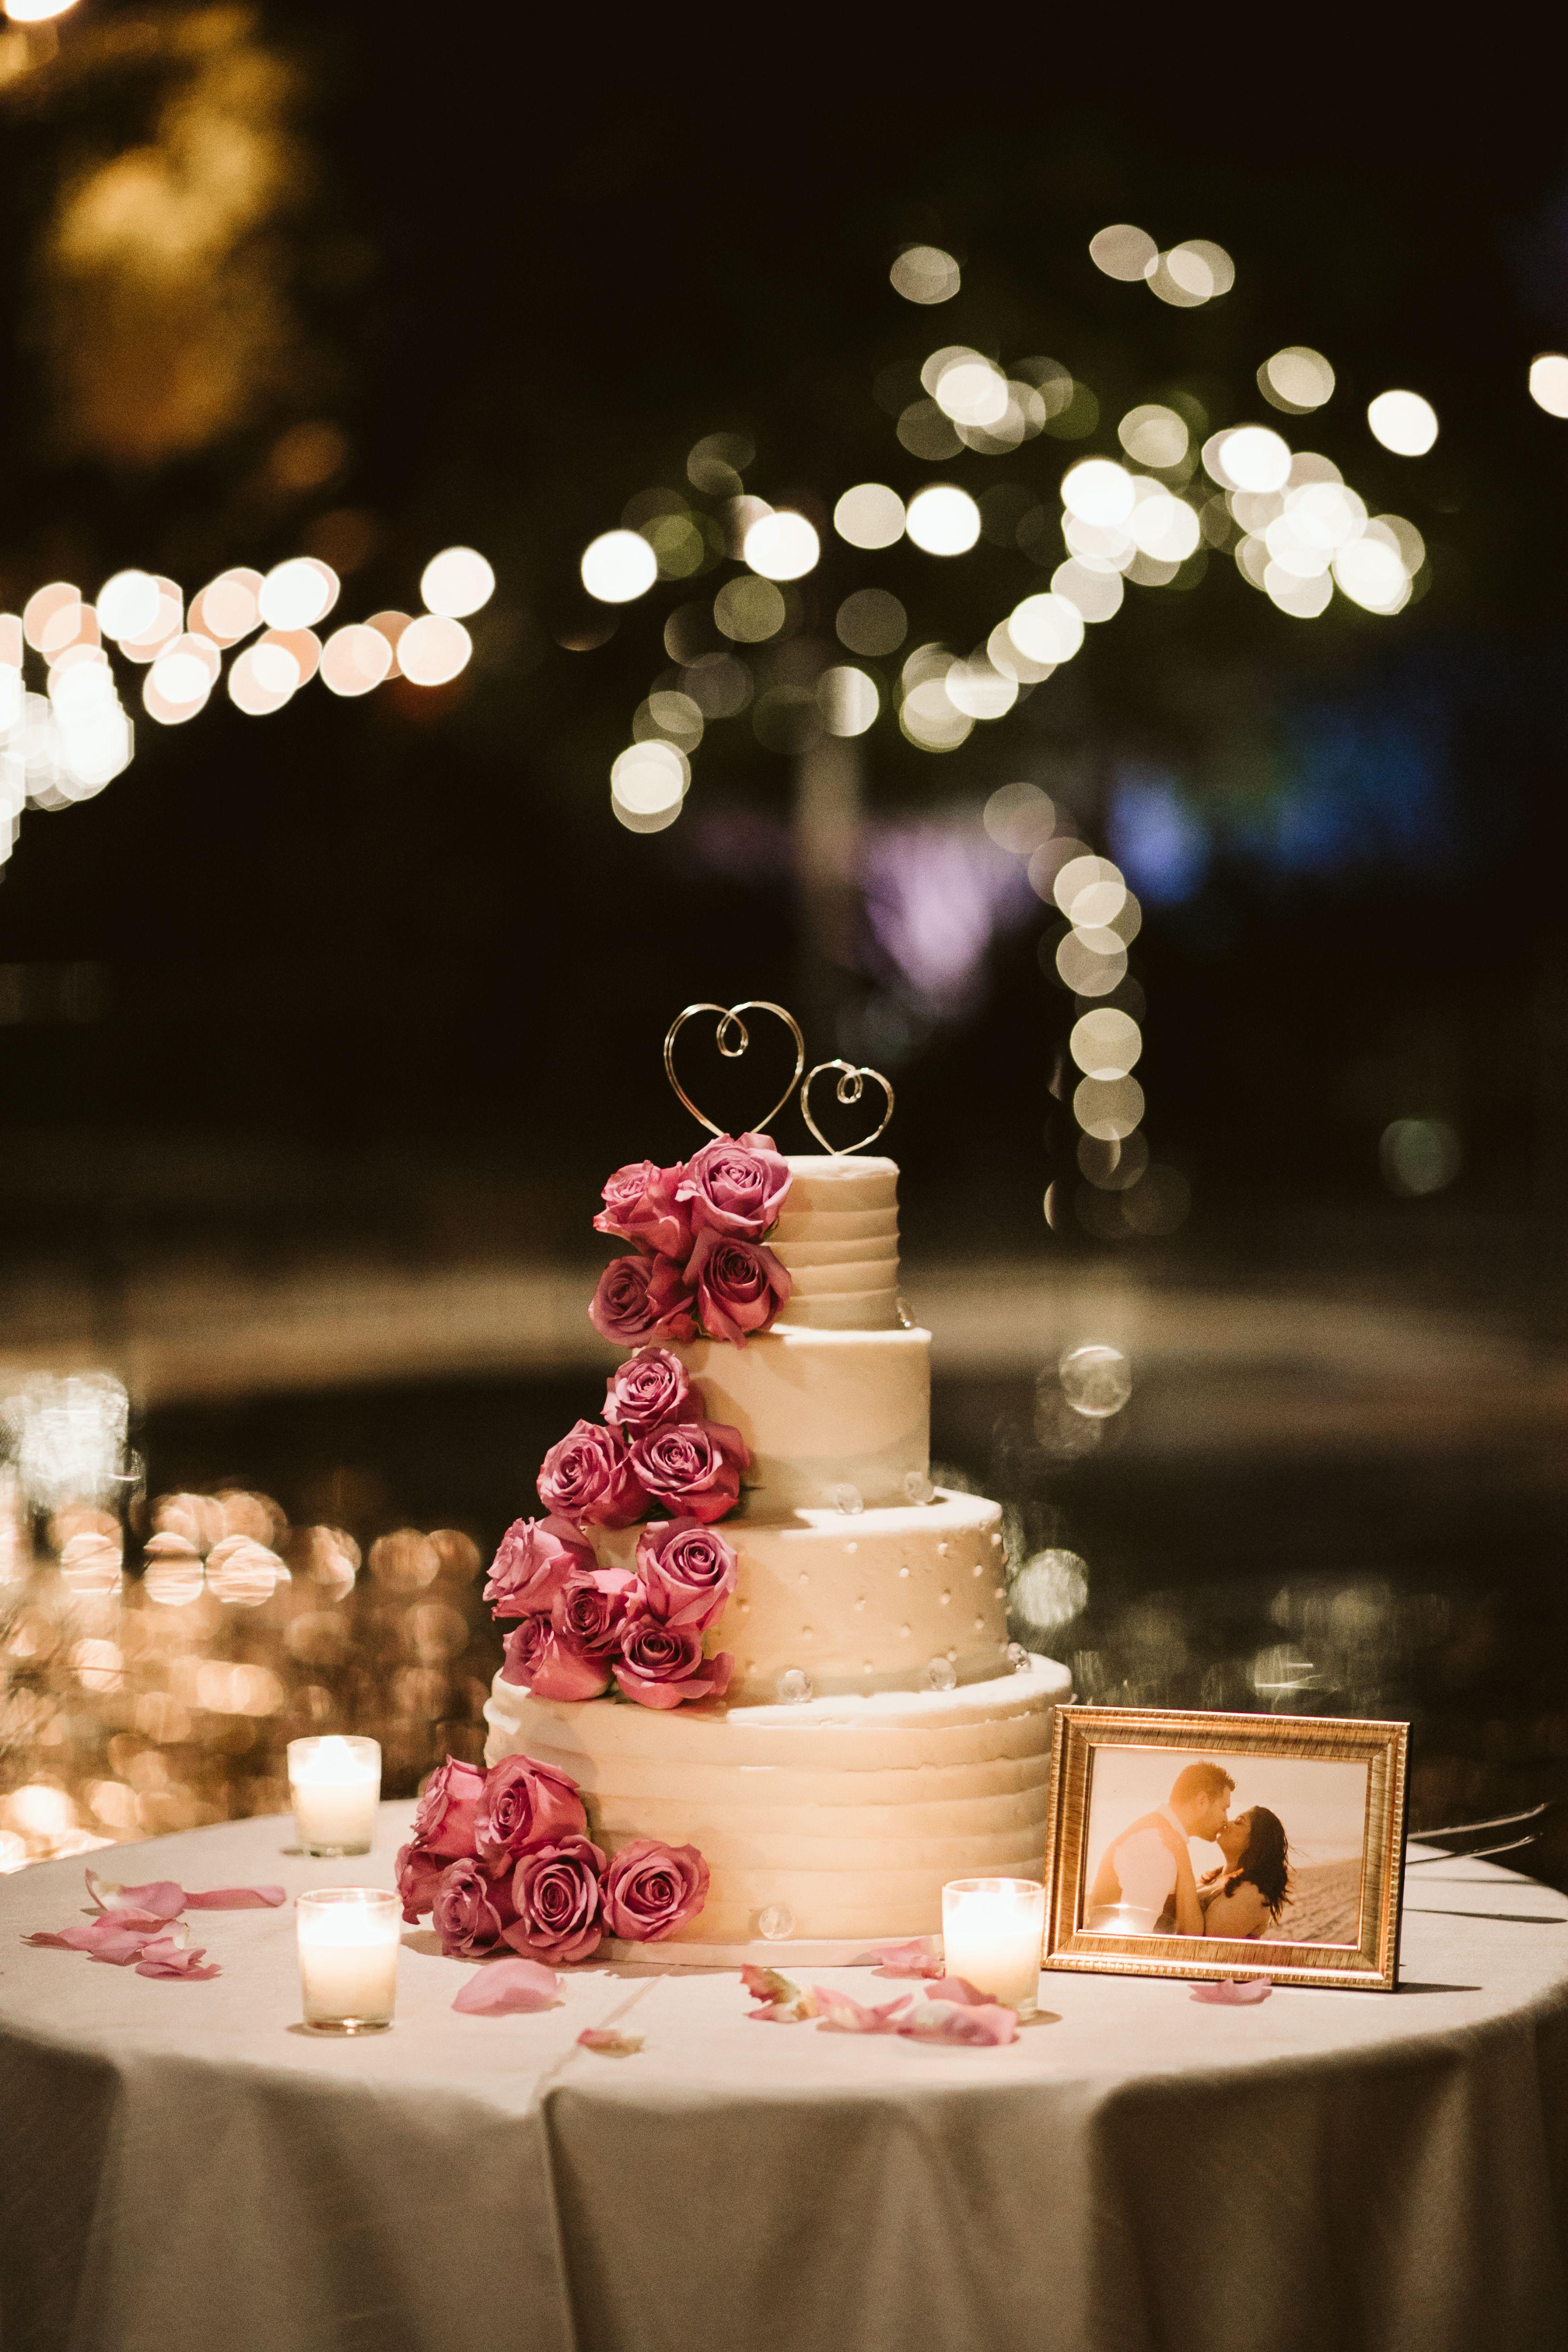 Susiecakes weddings march wedding wedding cakes